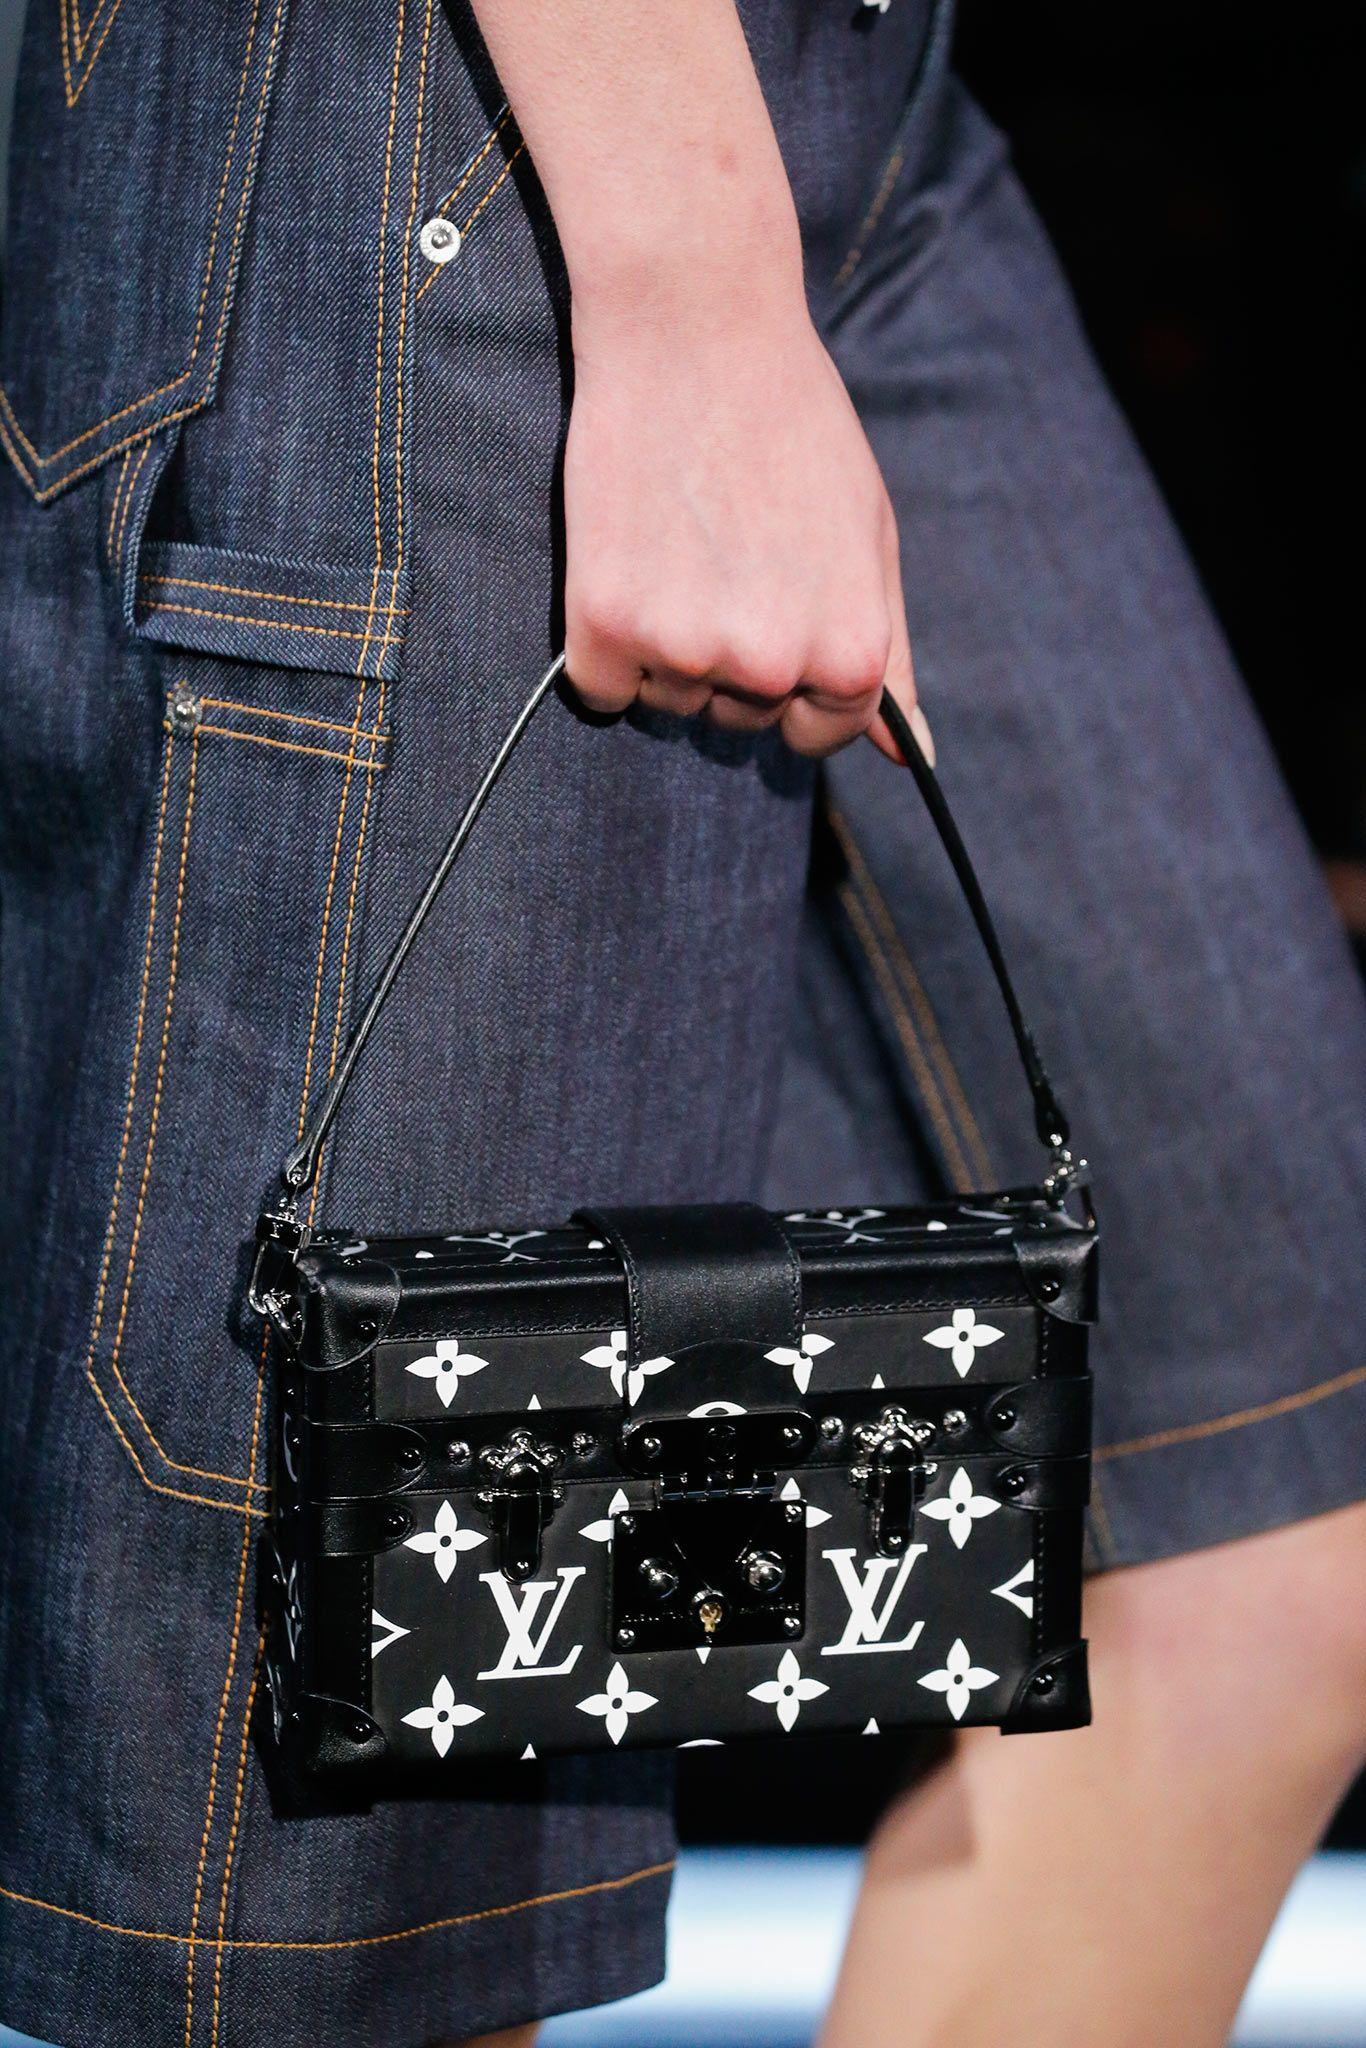 c4e9231a363a 🔱yellow dιaмond🔱 Louis Vuitton Black Monogram Canvas Petite Malle Bag -  Spring 2015